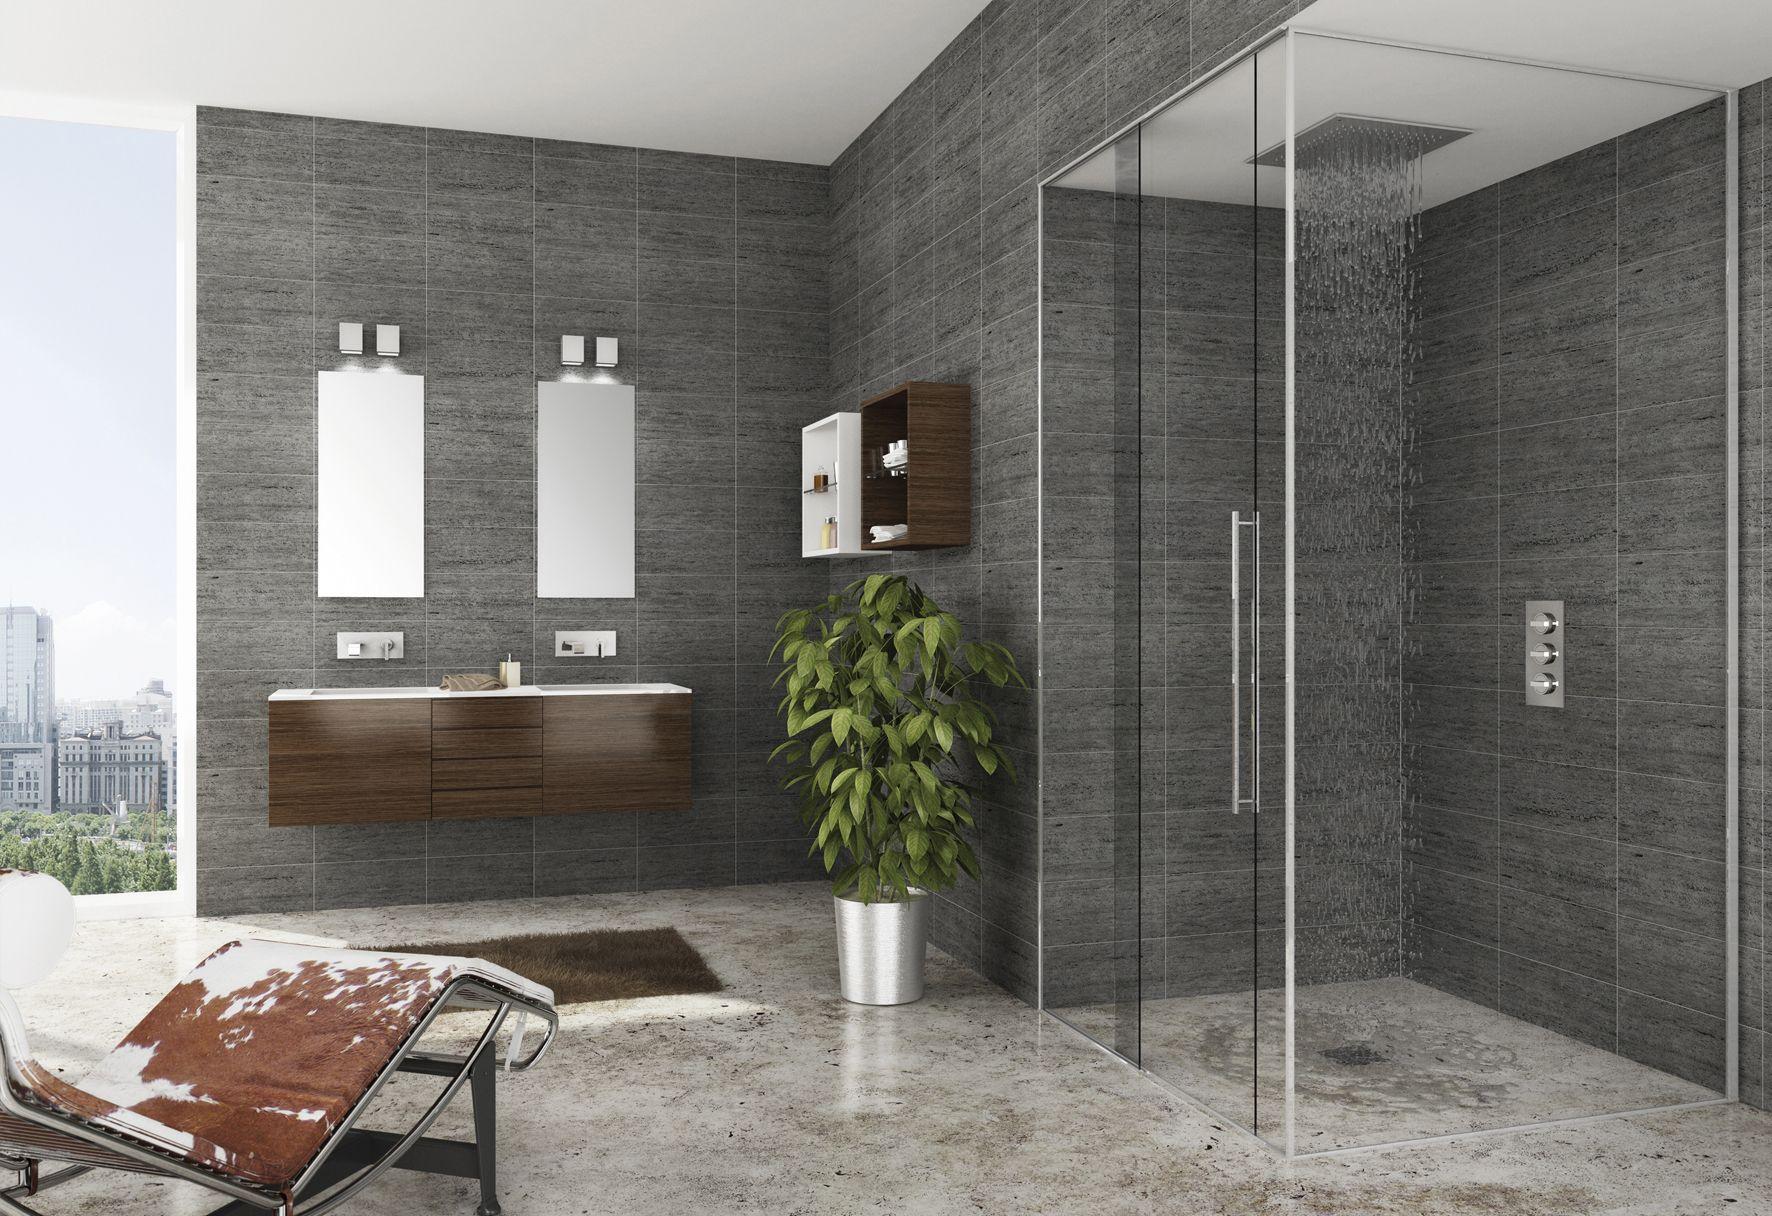 Valsir Floor Level Shower Systems Sistemi doccia a filo